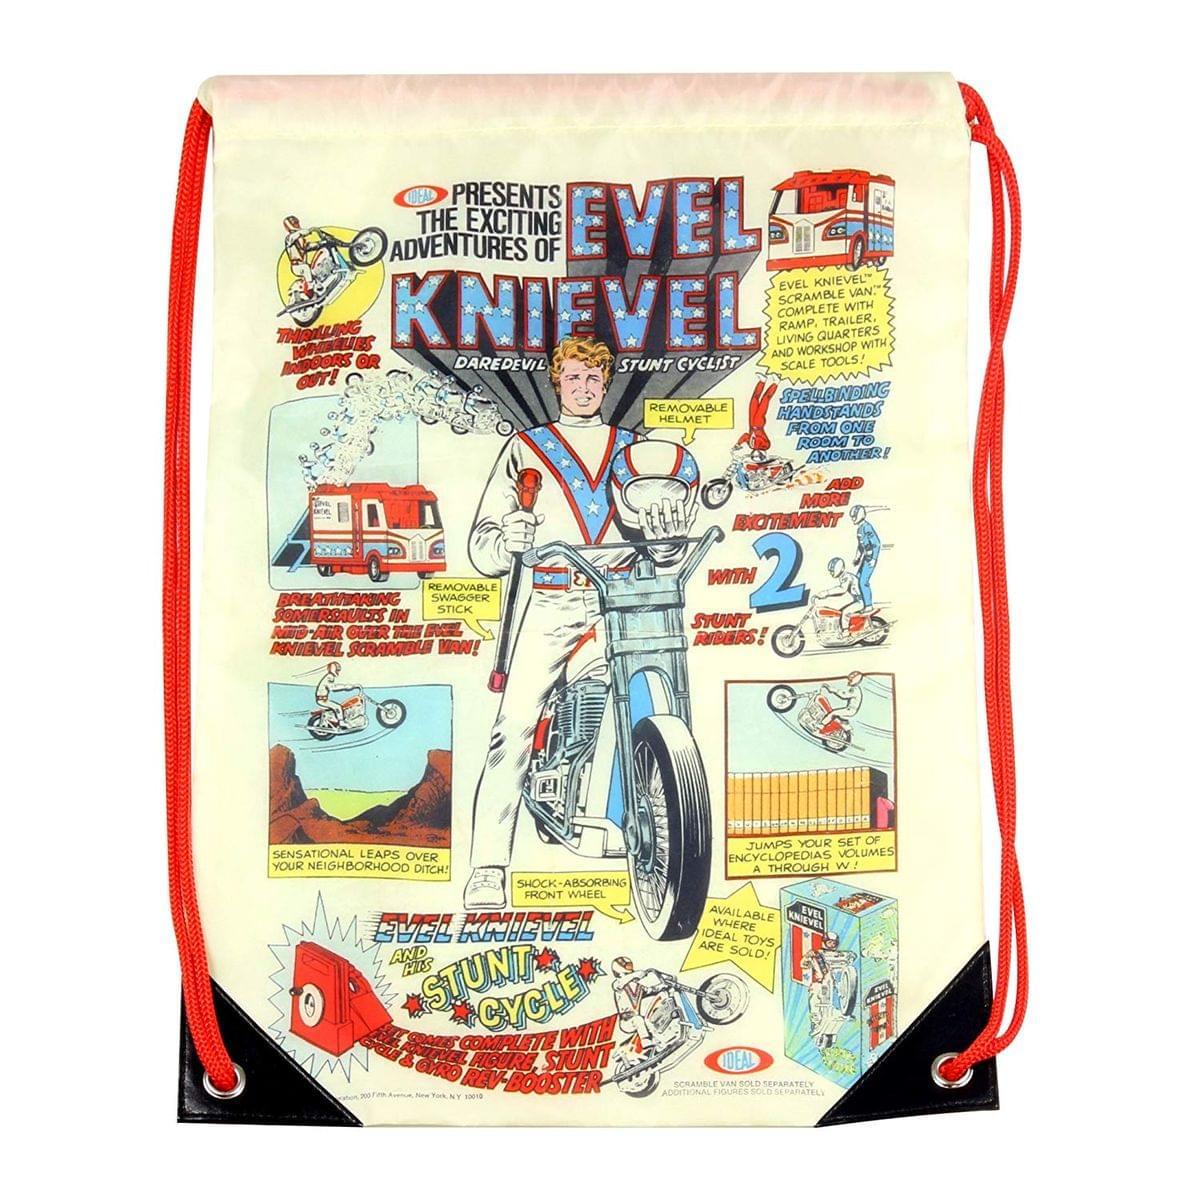 Evel Knievel 17-Inch Polyester Drawstring Cinch Bag